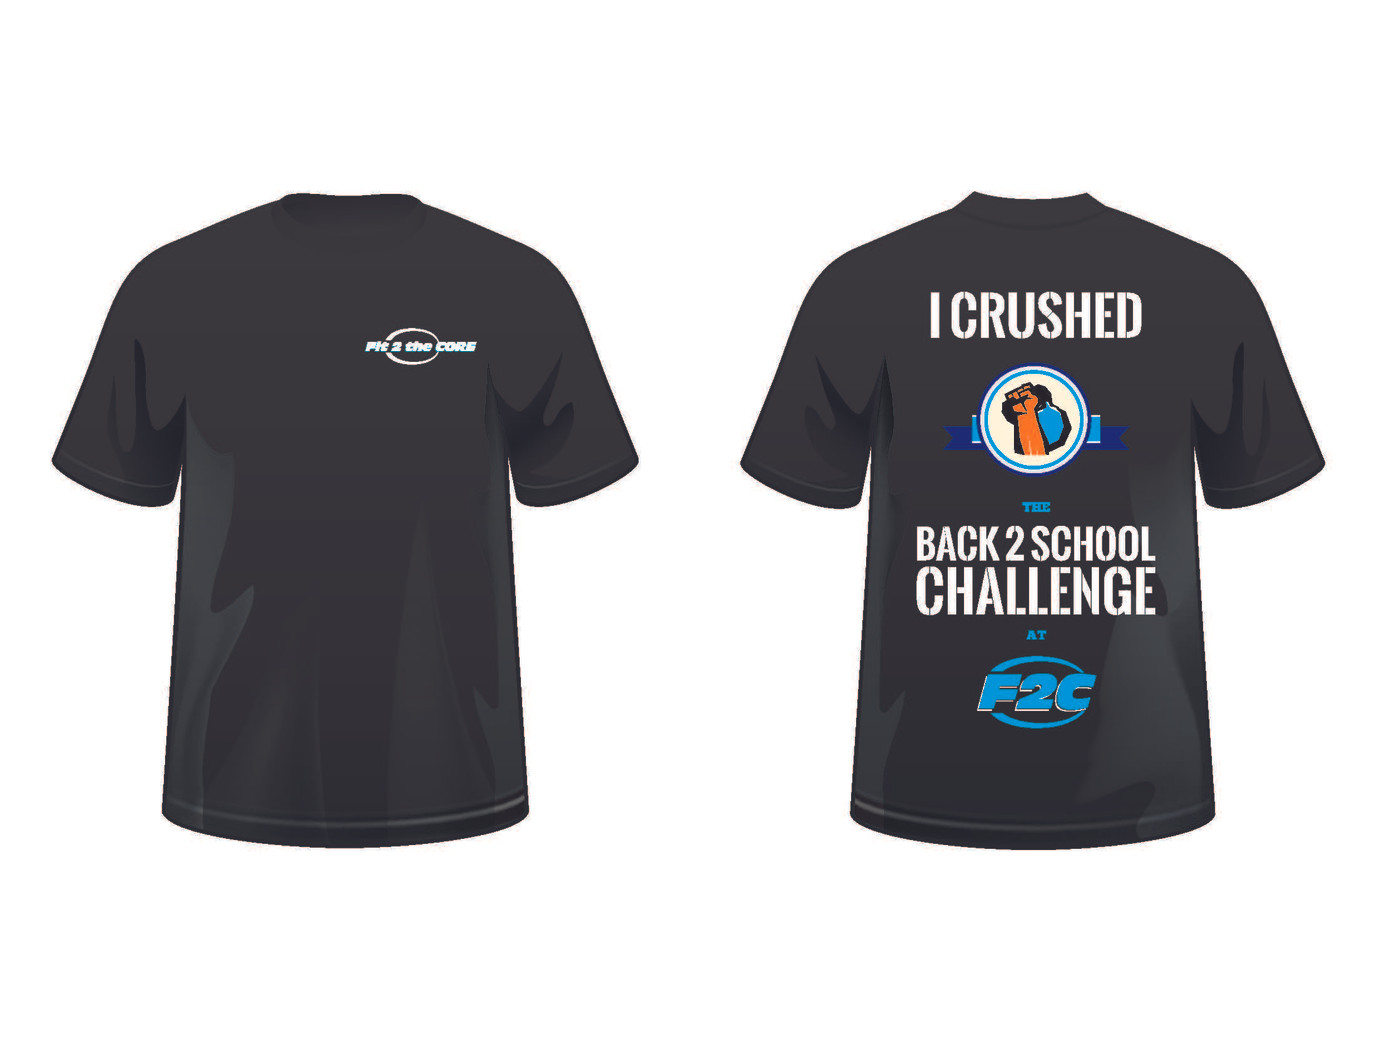 Gym challenge T-shirt